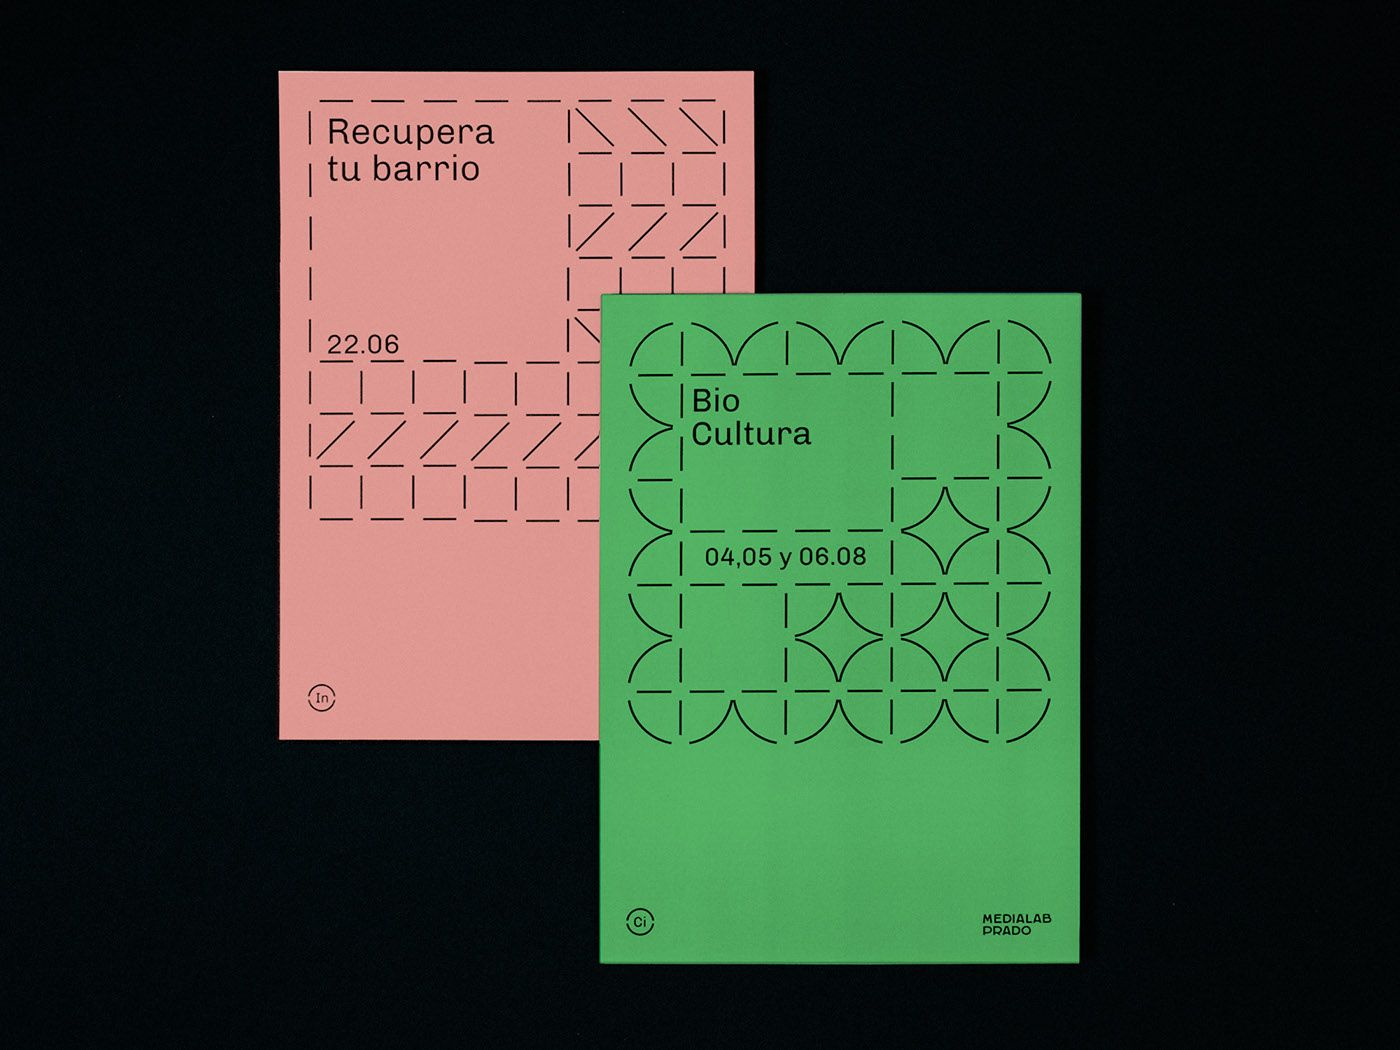 Medialab Pradobrand Identity Tata Friends Design Studio Madrid  # Muebles Tata Vasco